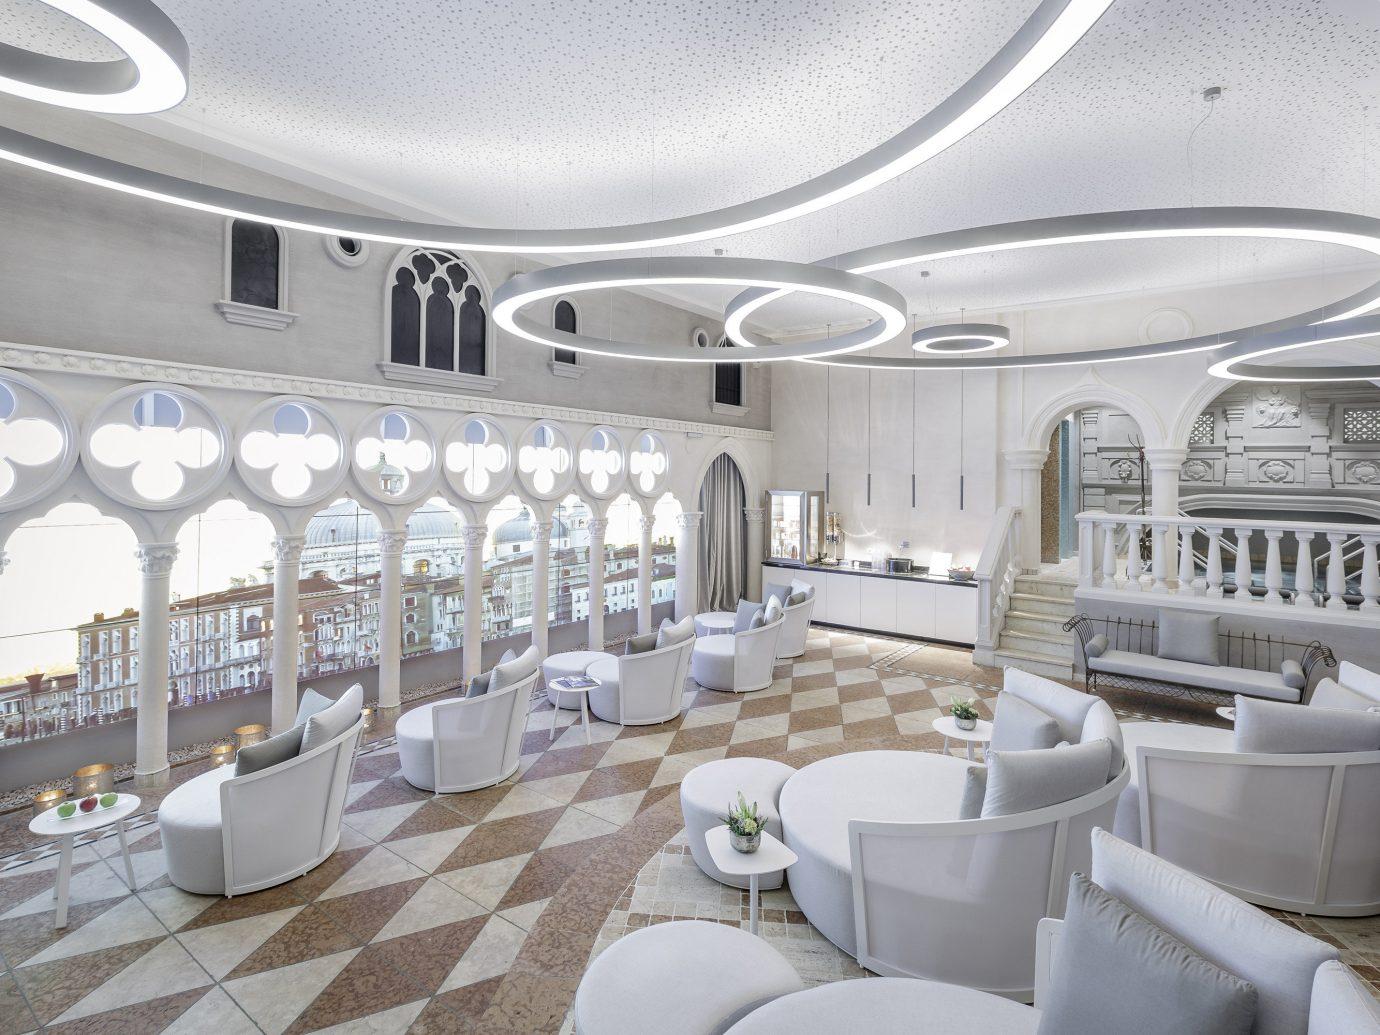 Secret Getaways Trip Ideas Winter interior design indoor ceiling function hall real estate Lobby daylighting interior designer